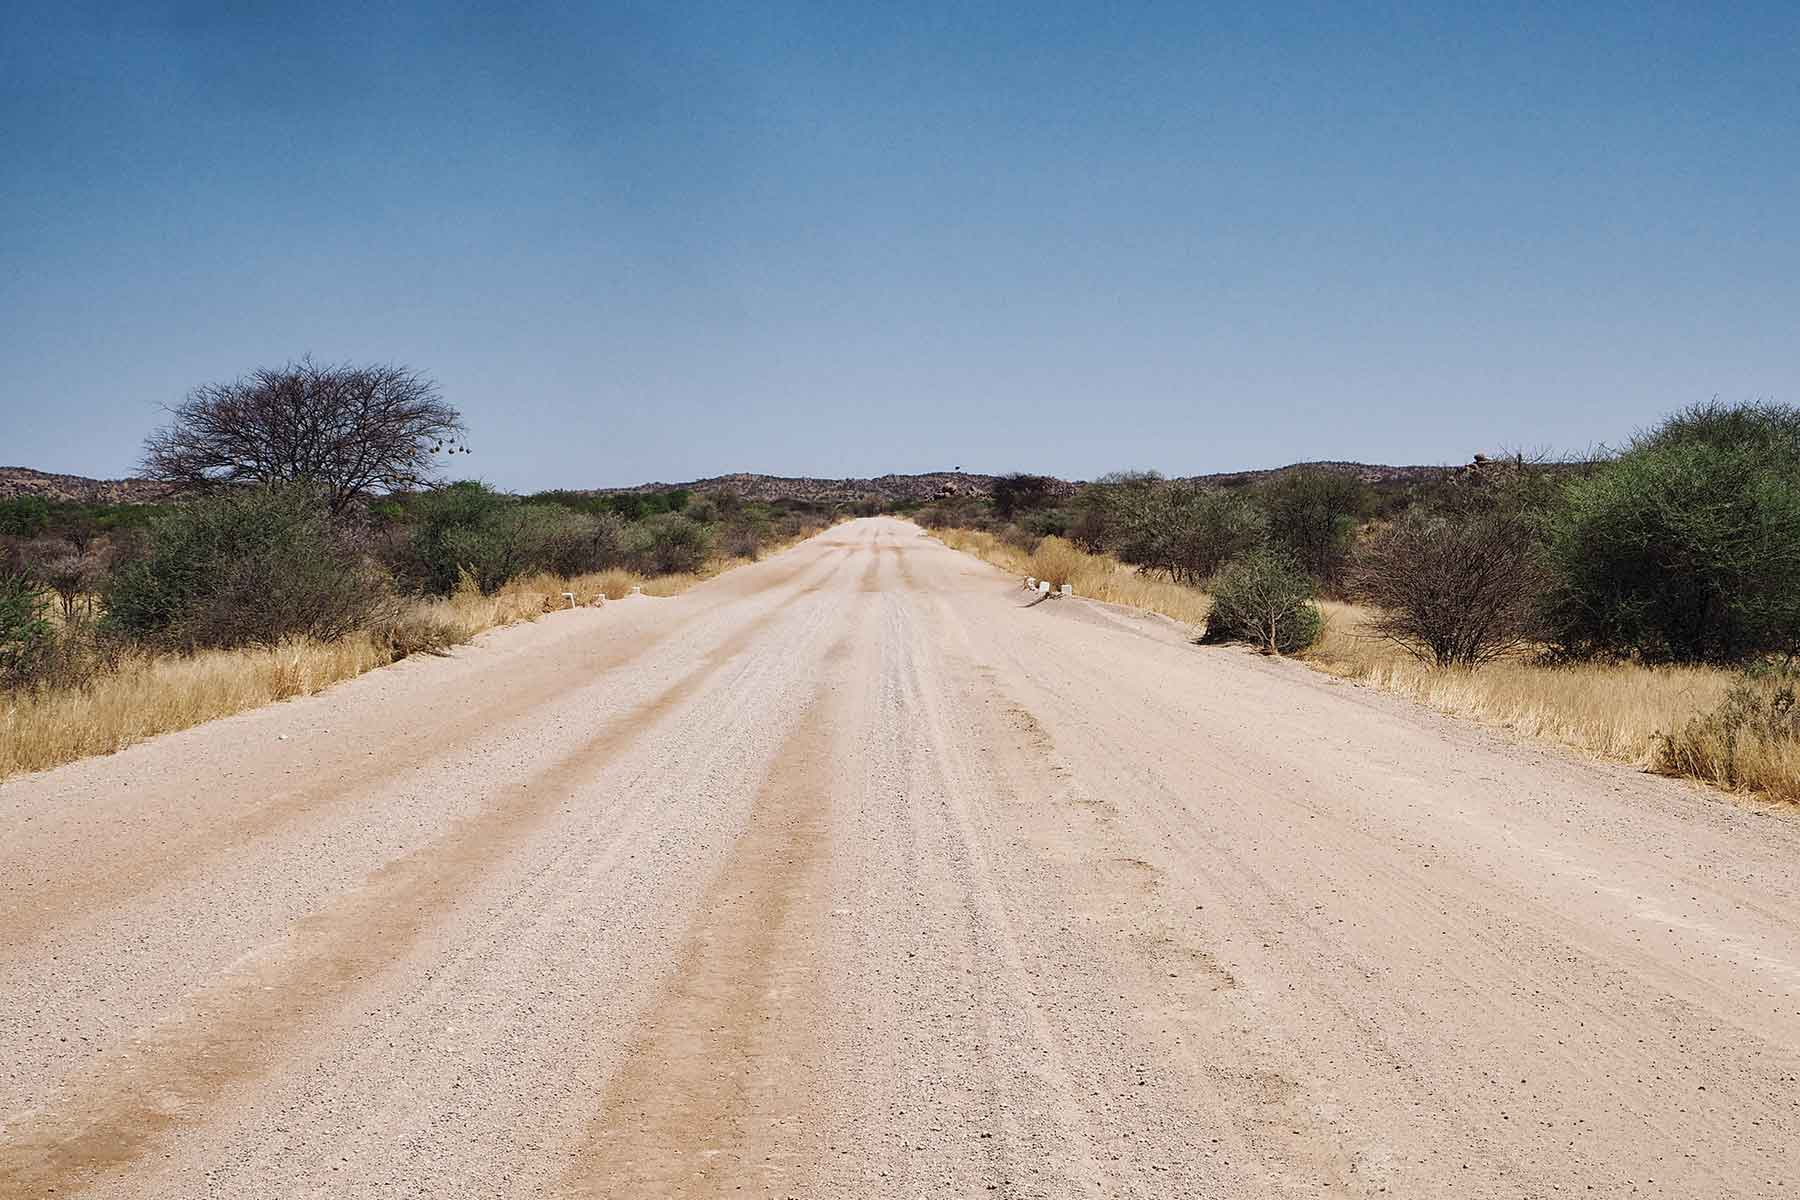 Tiere beobachten im Etosha Nationalpark